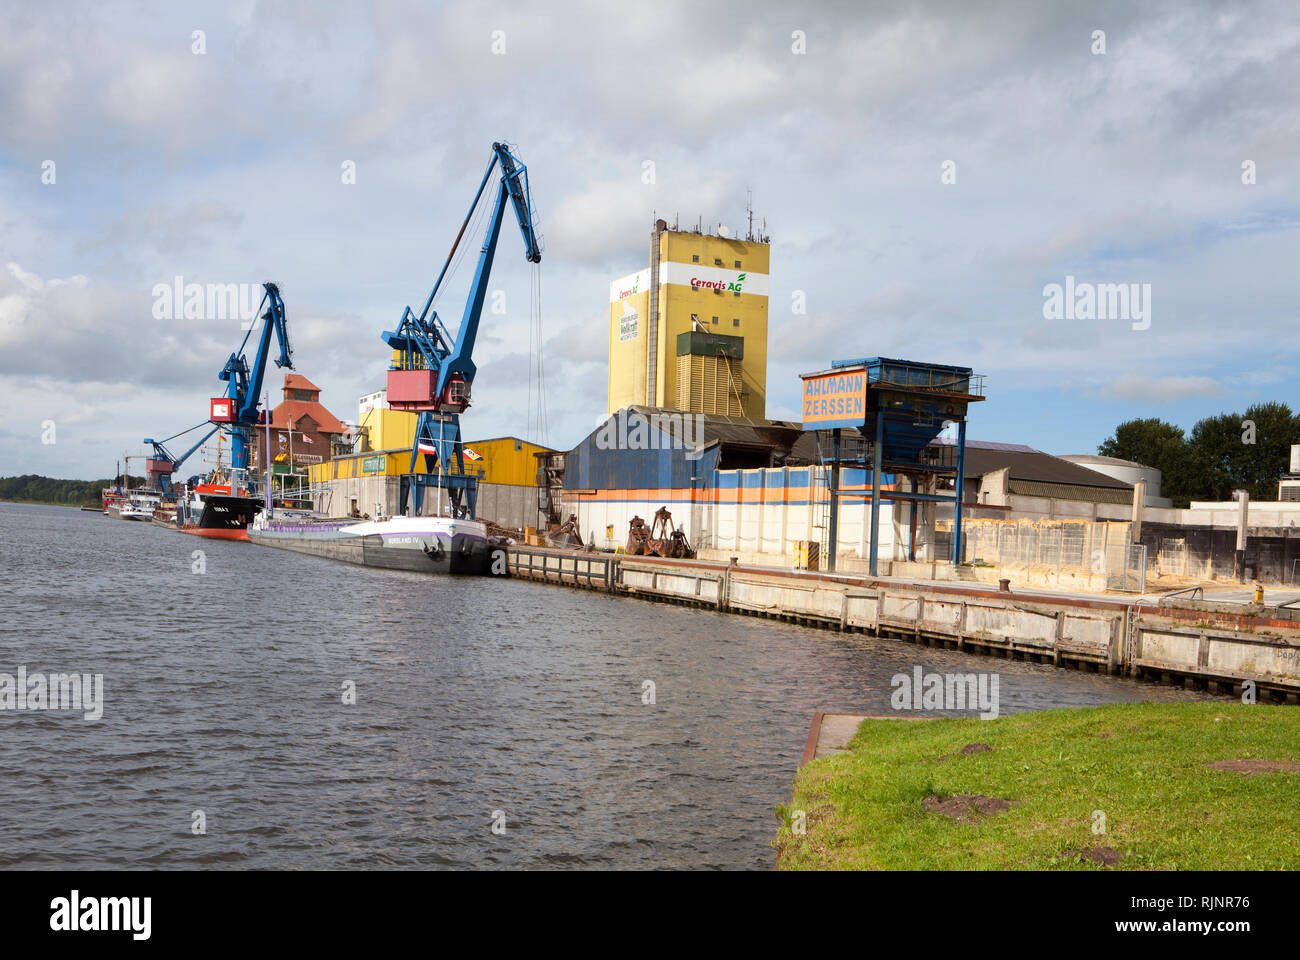 Rendsburg port, Kiel Canal, Rendsburg, Schleswig-Holstein, Germany - Stock Image